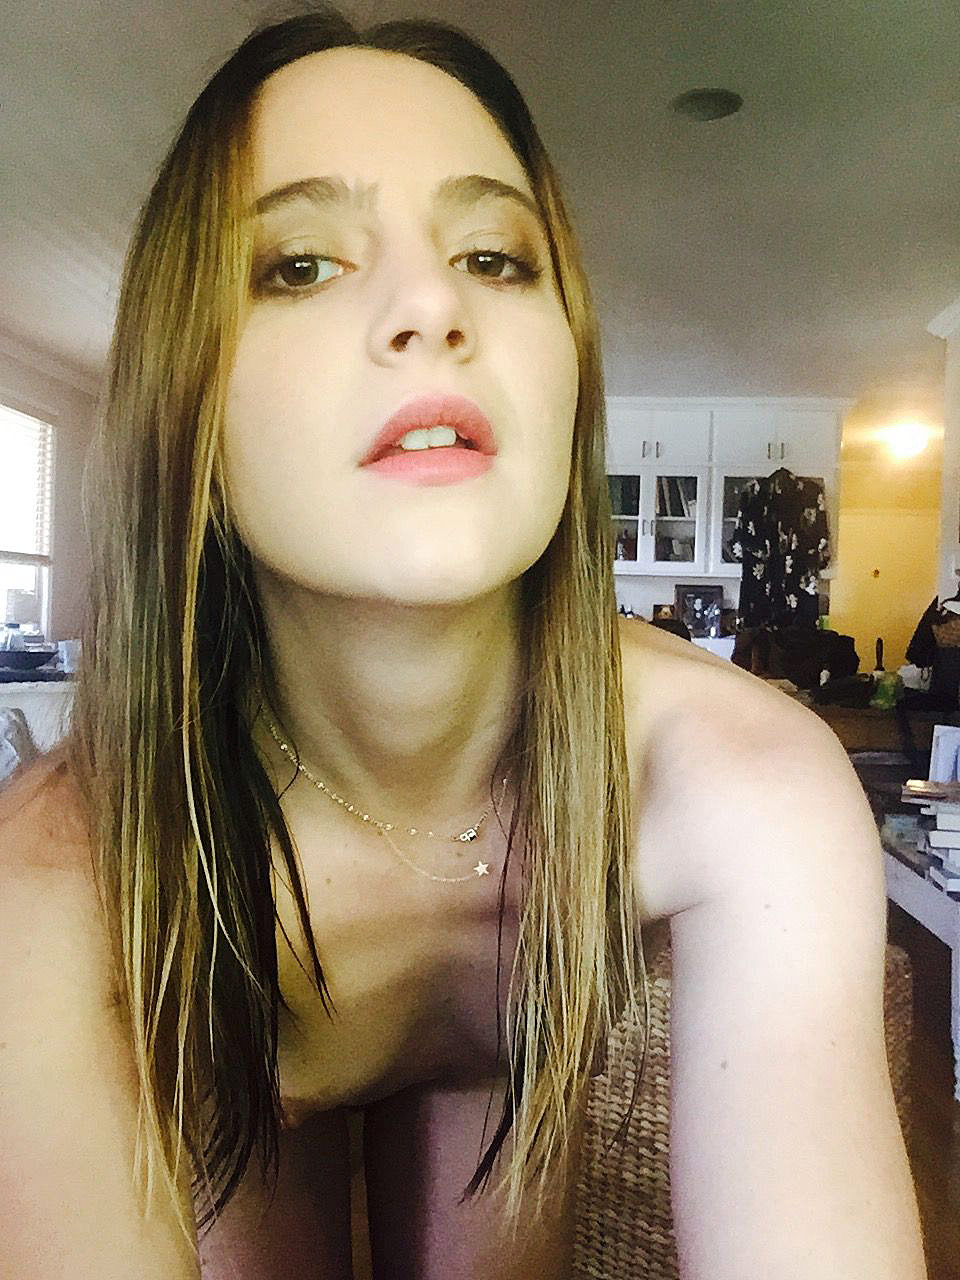 Sex Alexa Nikolas naked (92 photos), Topless, Paparazzi, Boobs, butt 2015